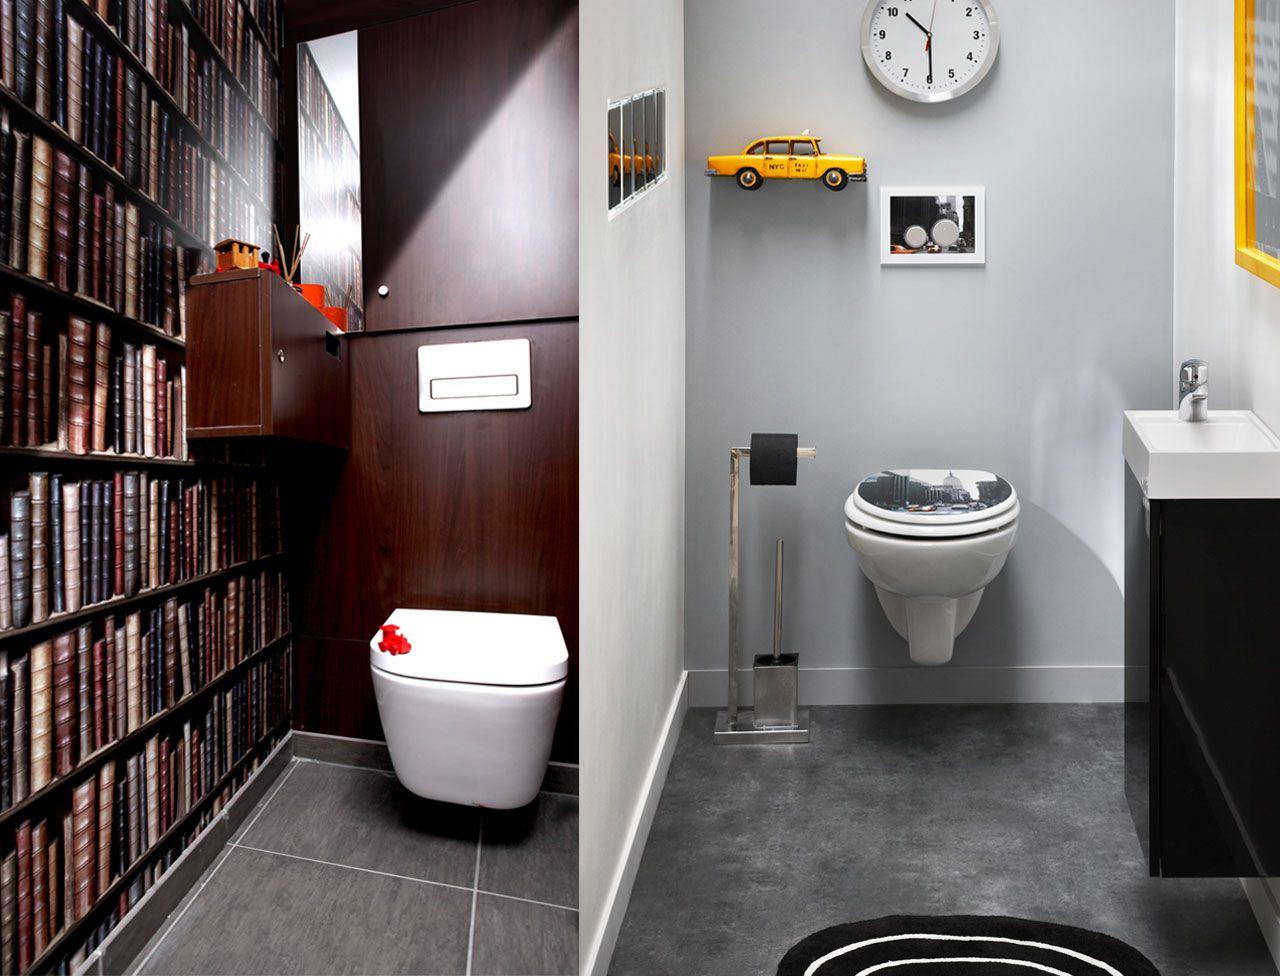 wc design Recherche Google wc design